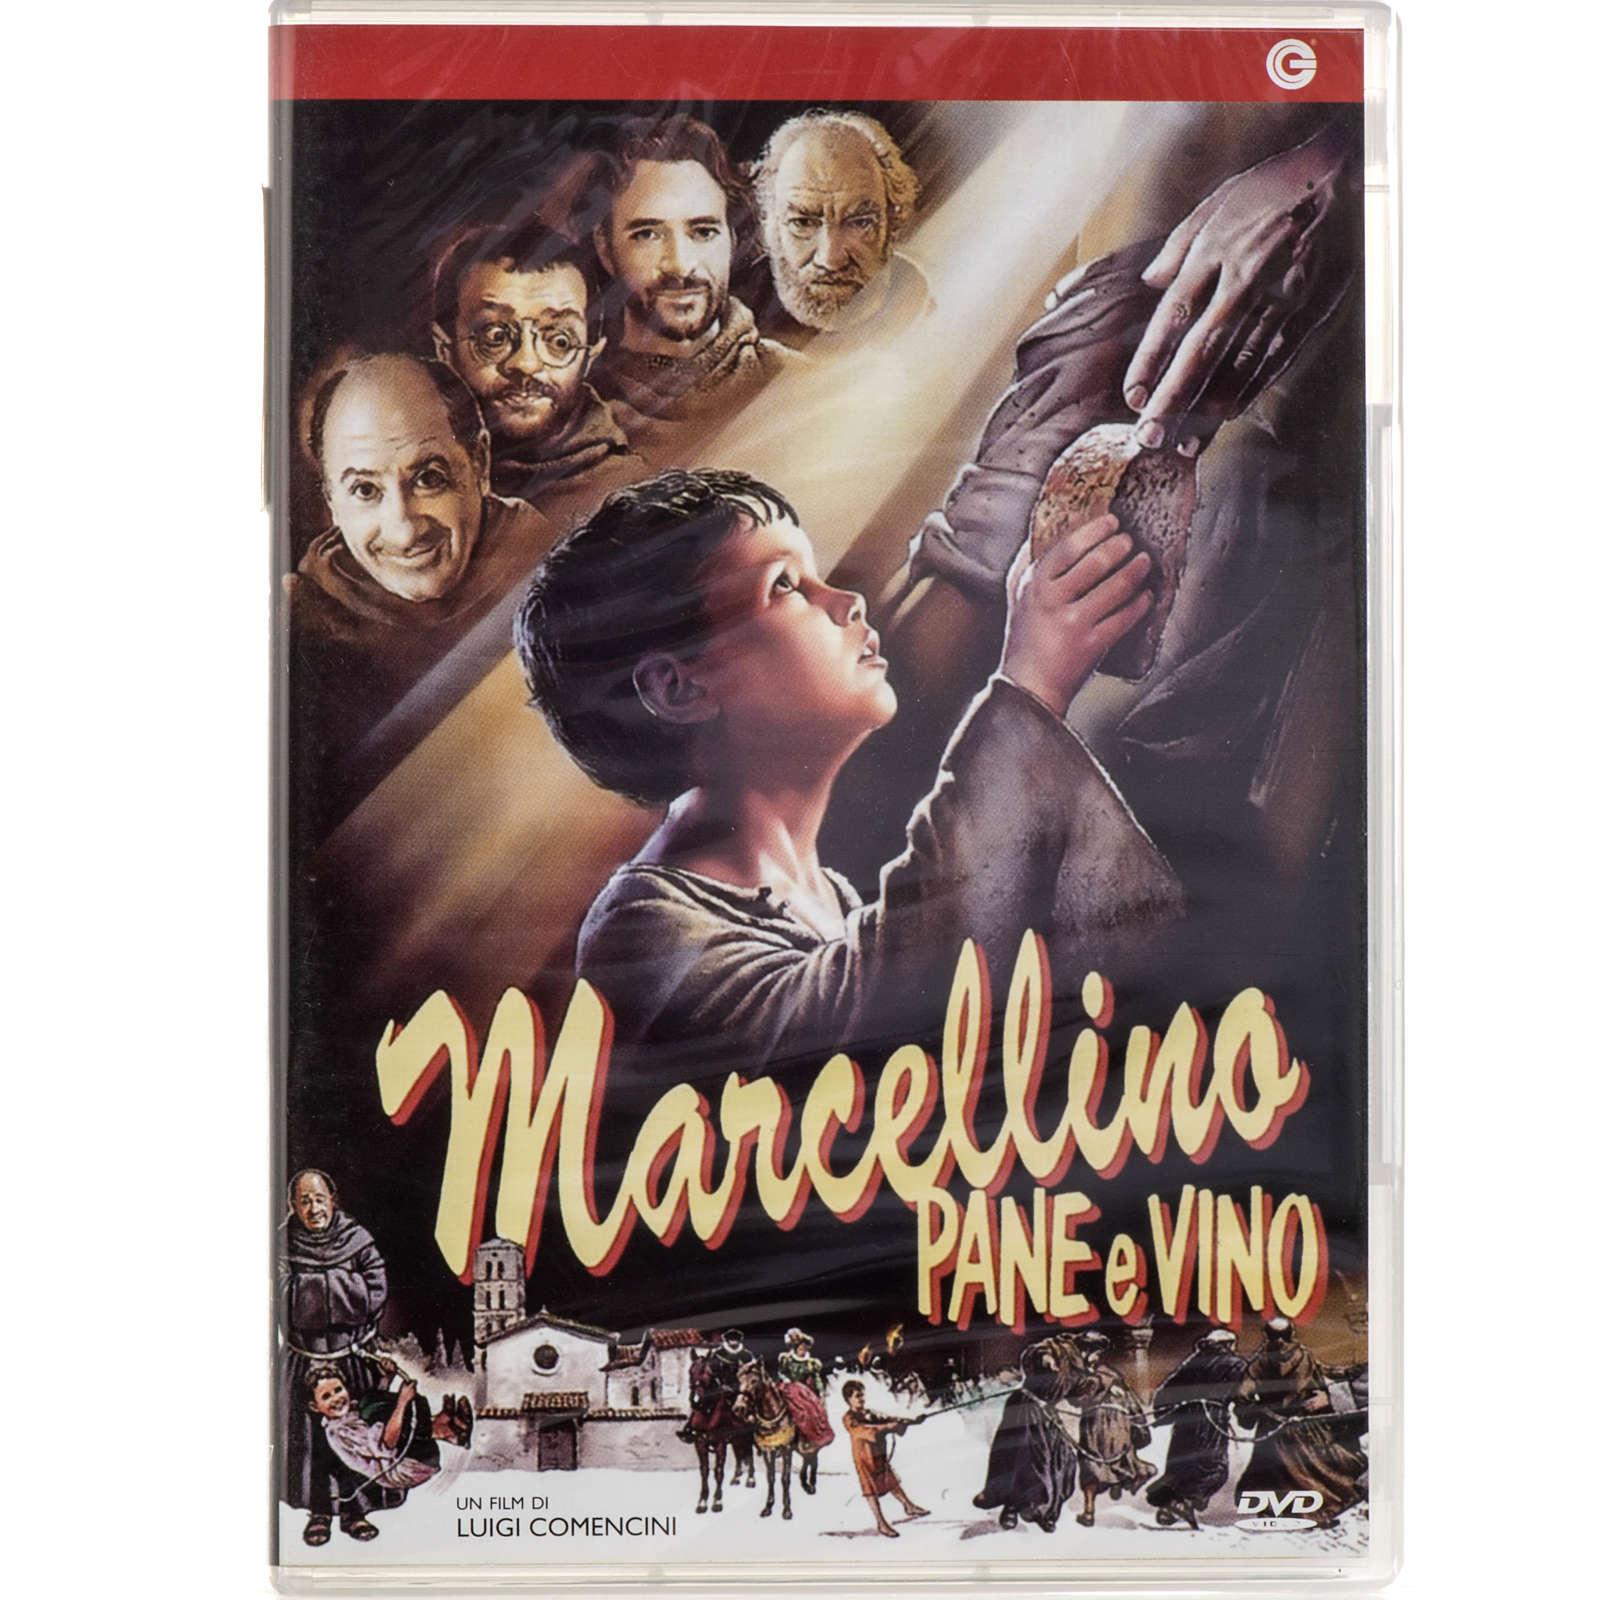 Marcellino pane e vino DVD 3